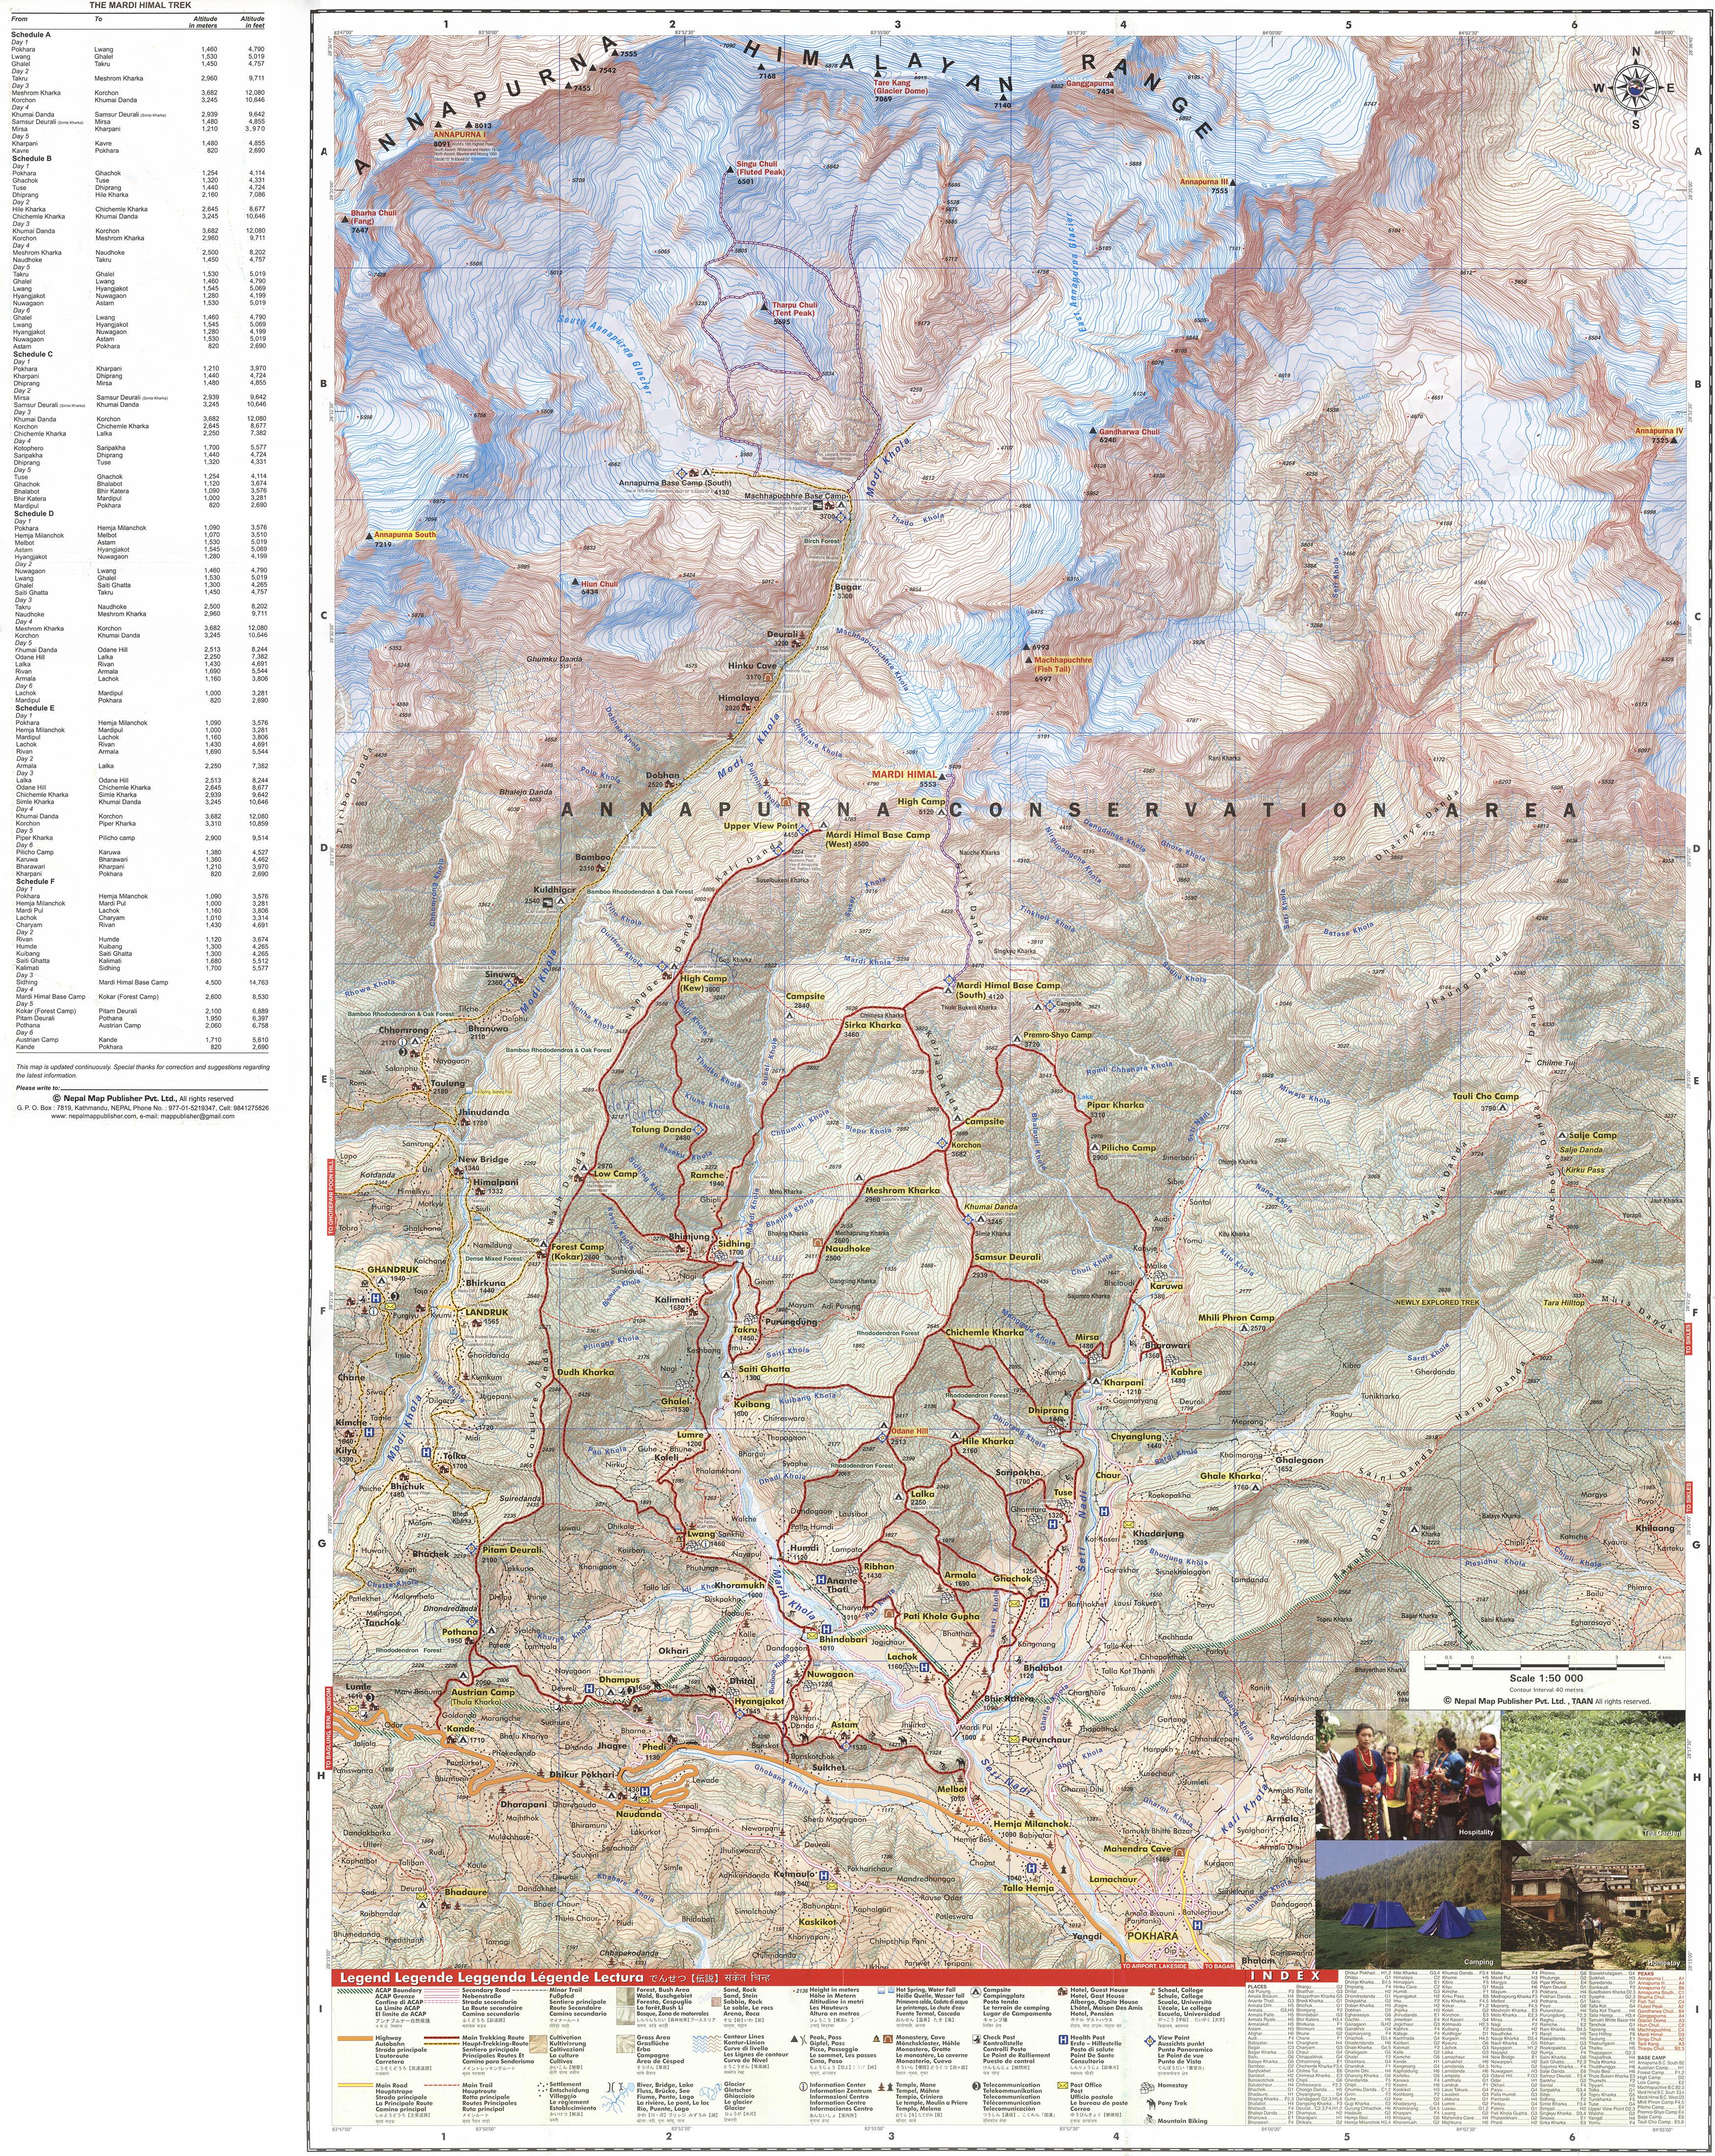 Карта маршрутов по горному массиву Аннапурна, Непал, масштаб 1:50000. Annapurna Mardy Himal Trek, Nepal